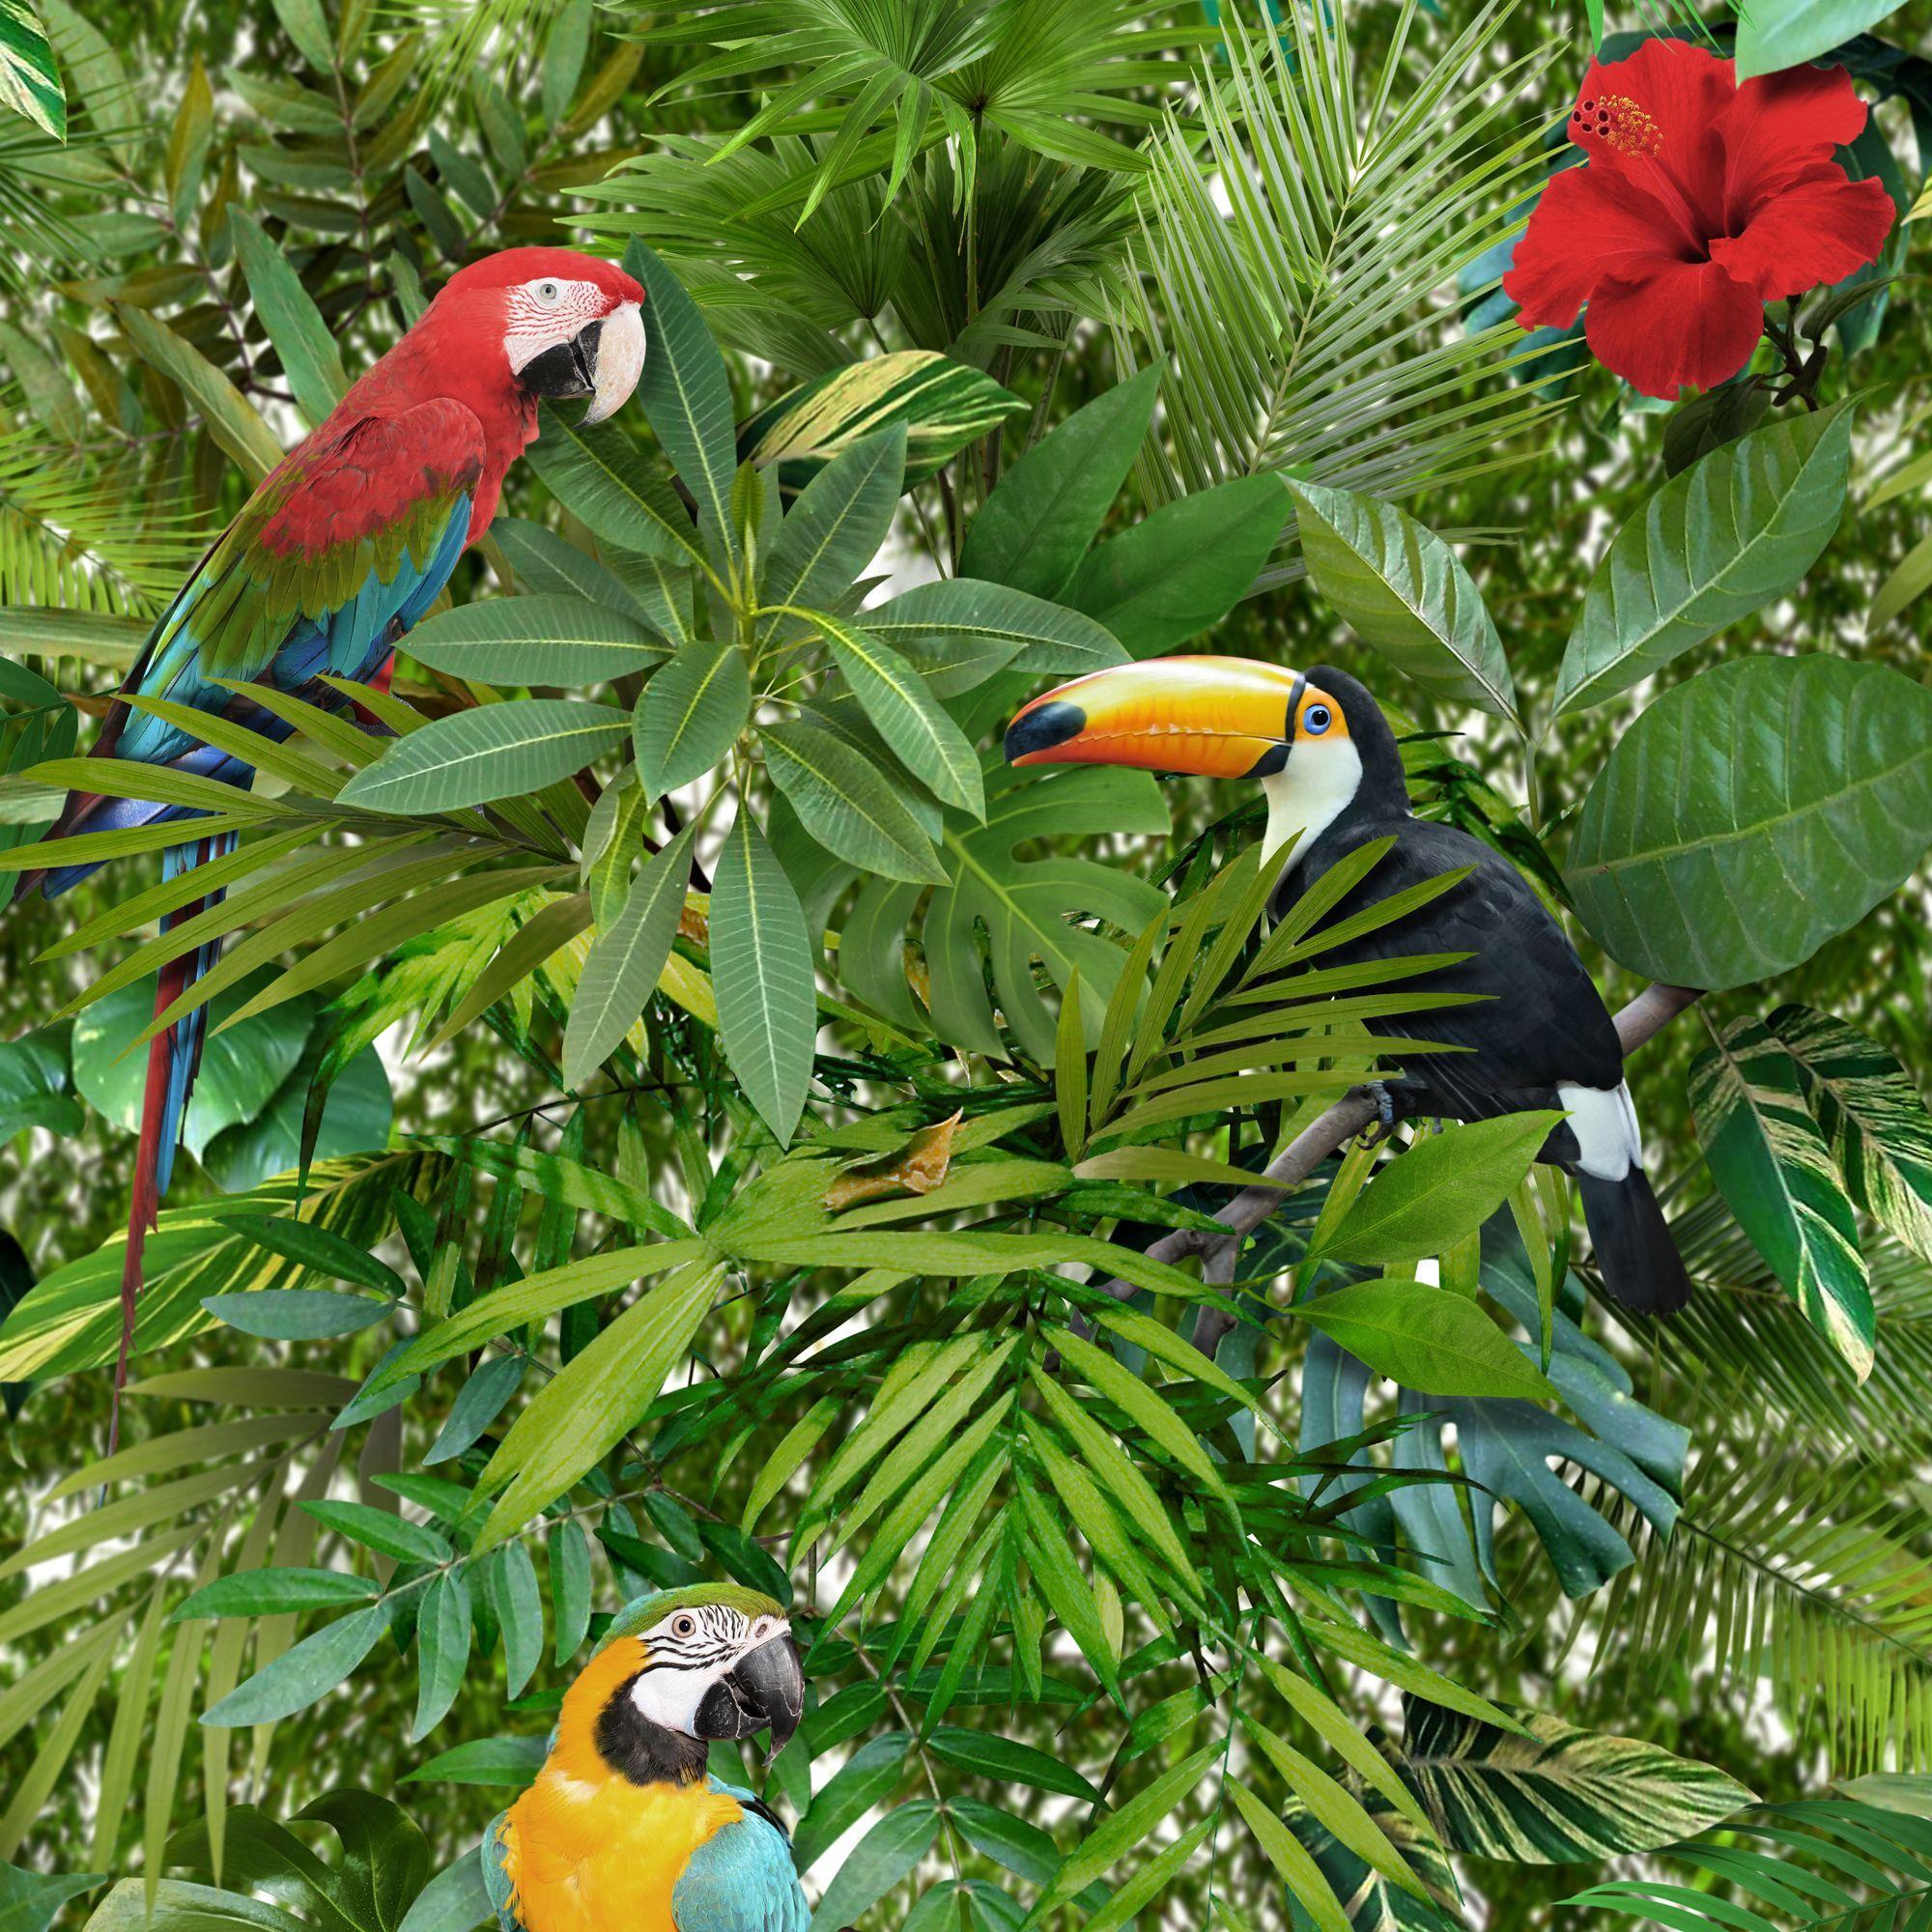 wallpaper tropical birds and foliage -#main